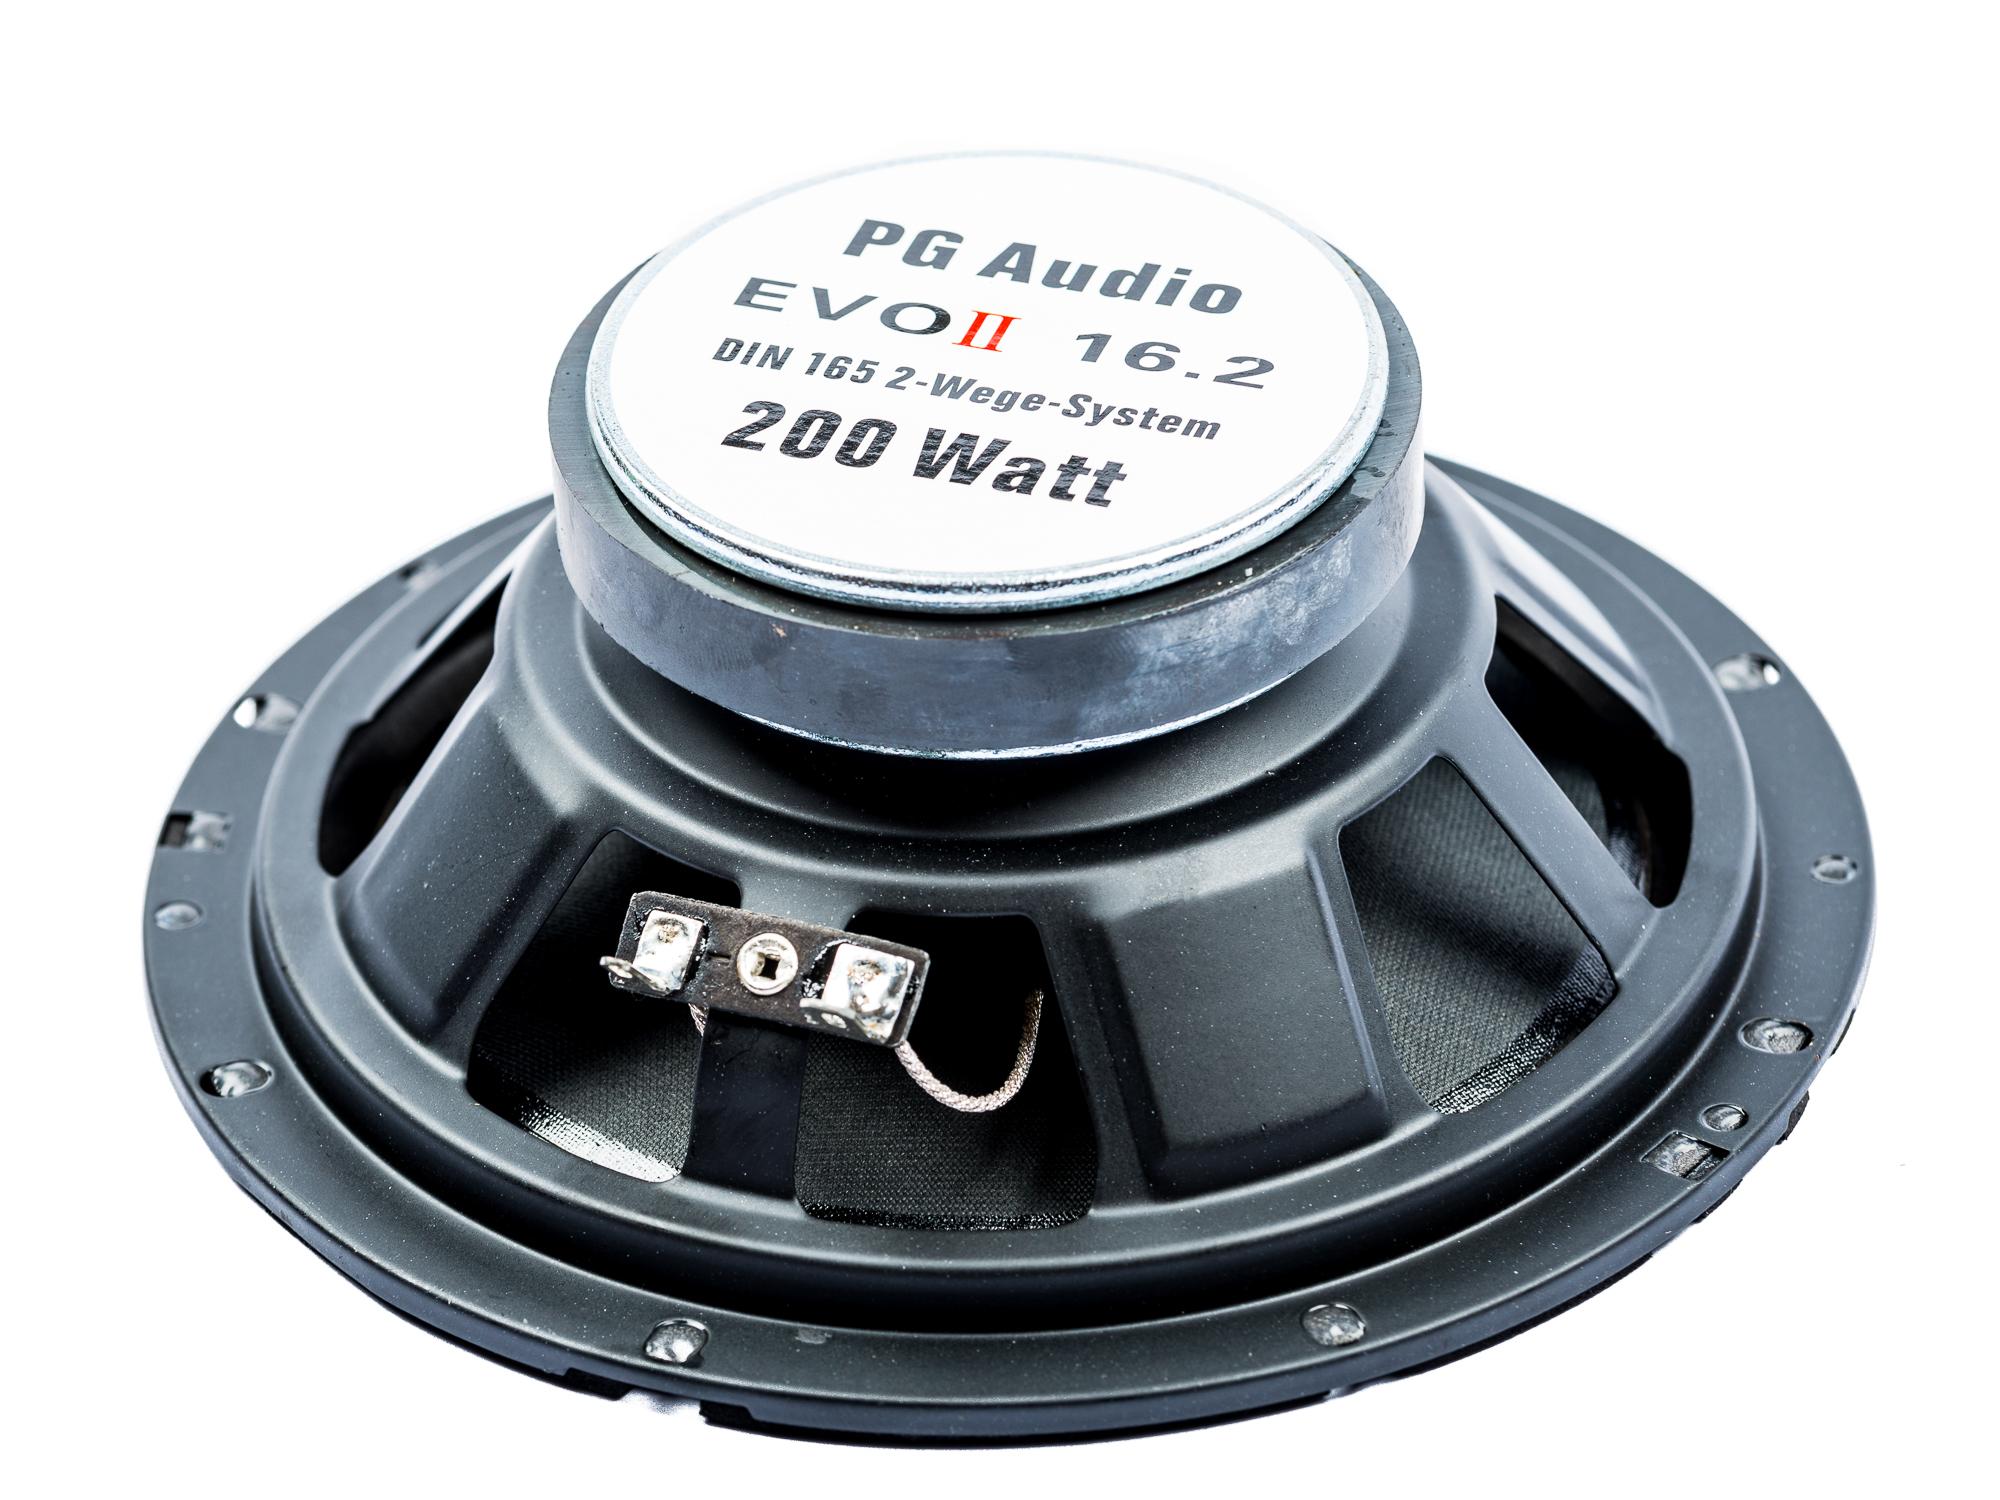 VW Scirocco Seat Mii Skoda Fabia Skoda City go Lautsprecher Einbauset Tür vorne PG Audio – Bild 3